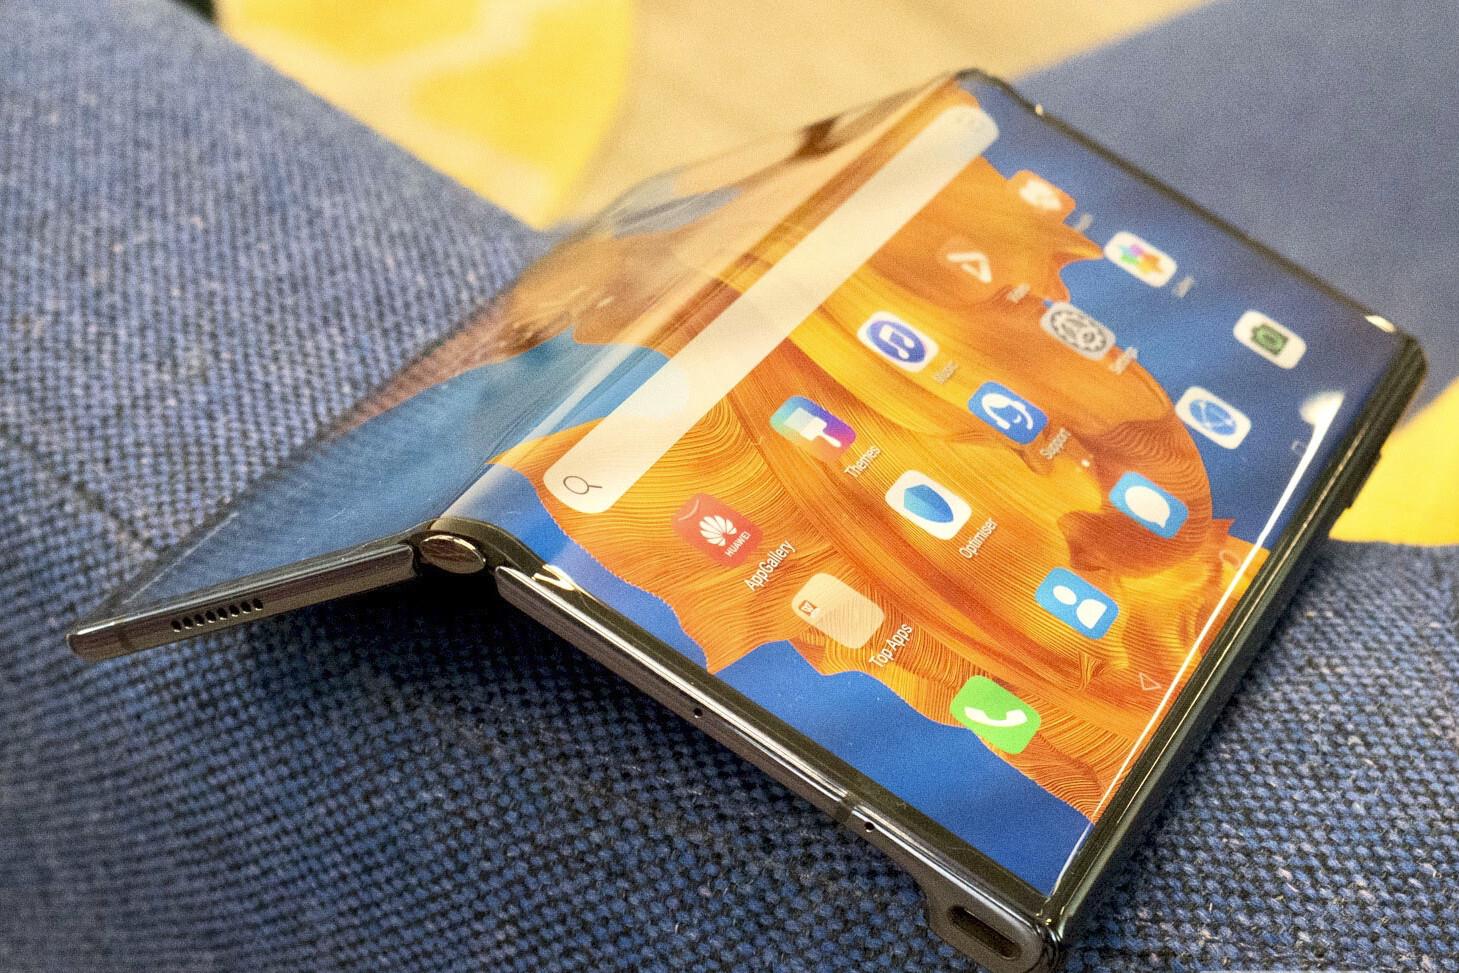 Характеристики нового складного флагмана Huawei Mate X2 утекли в сеть до анонса